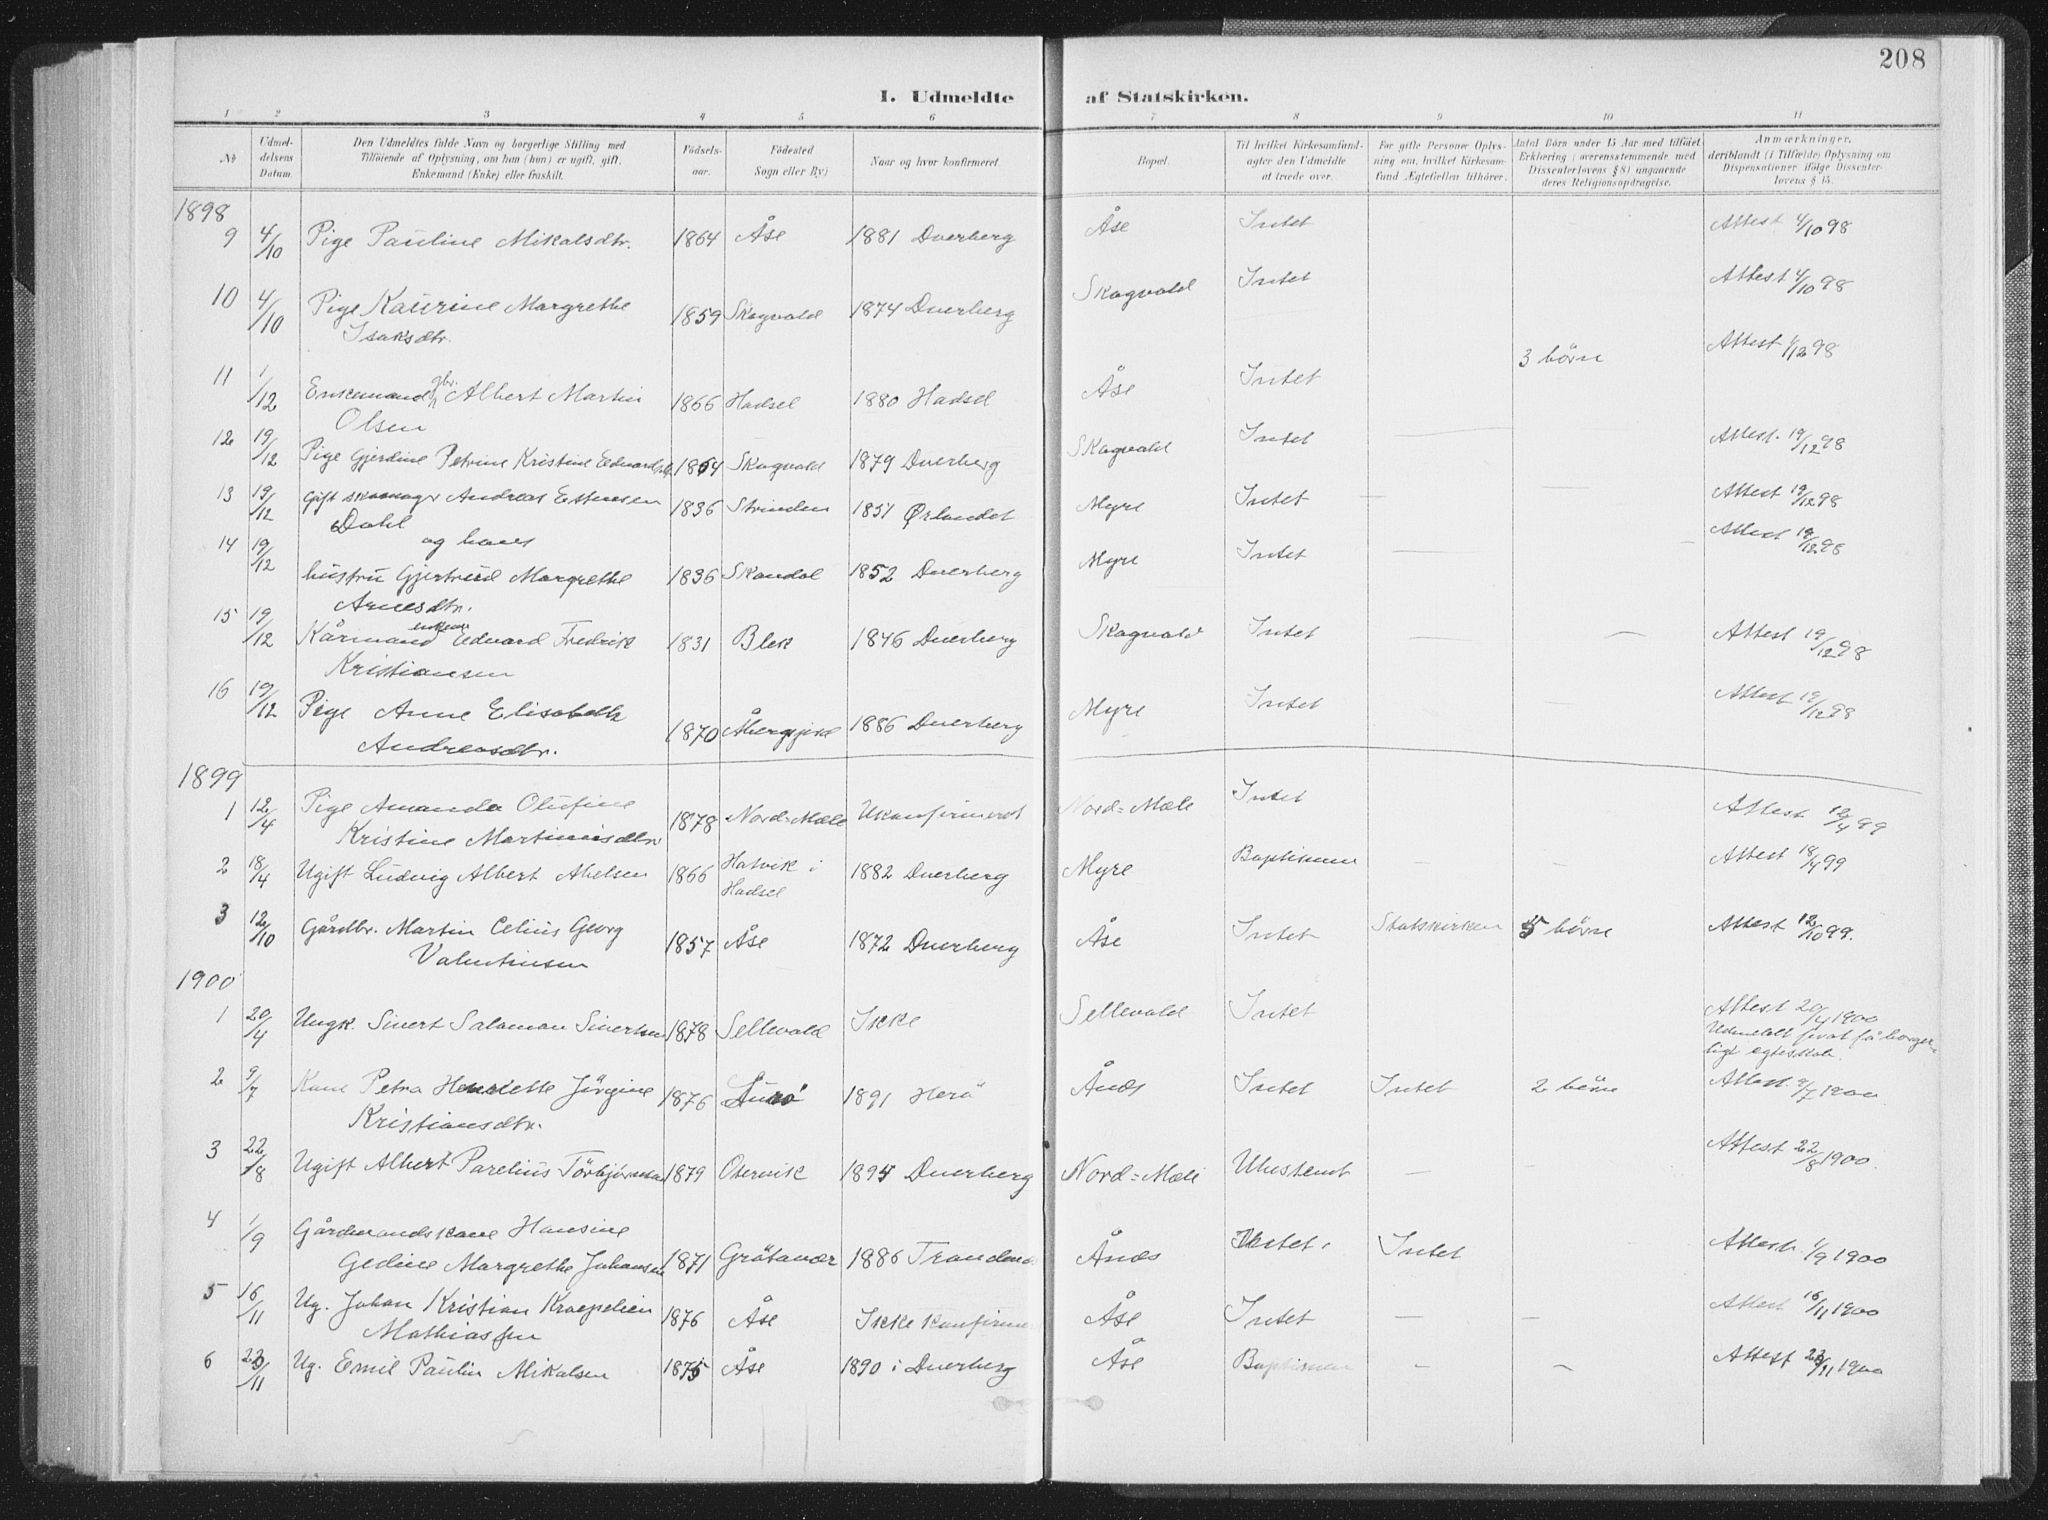 SAT, Ministerialprotokoller, klokkerbøker og fødselsregistre - Nordland, 897/L1400: Ministerialbok nr. 897A07, 1897-1908, s. 208